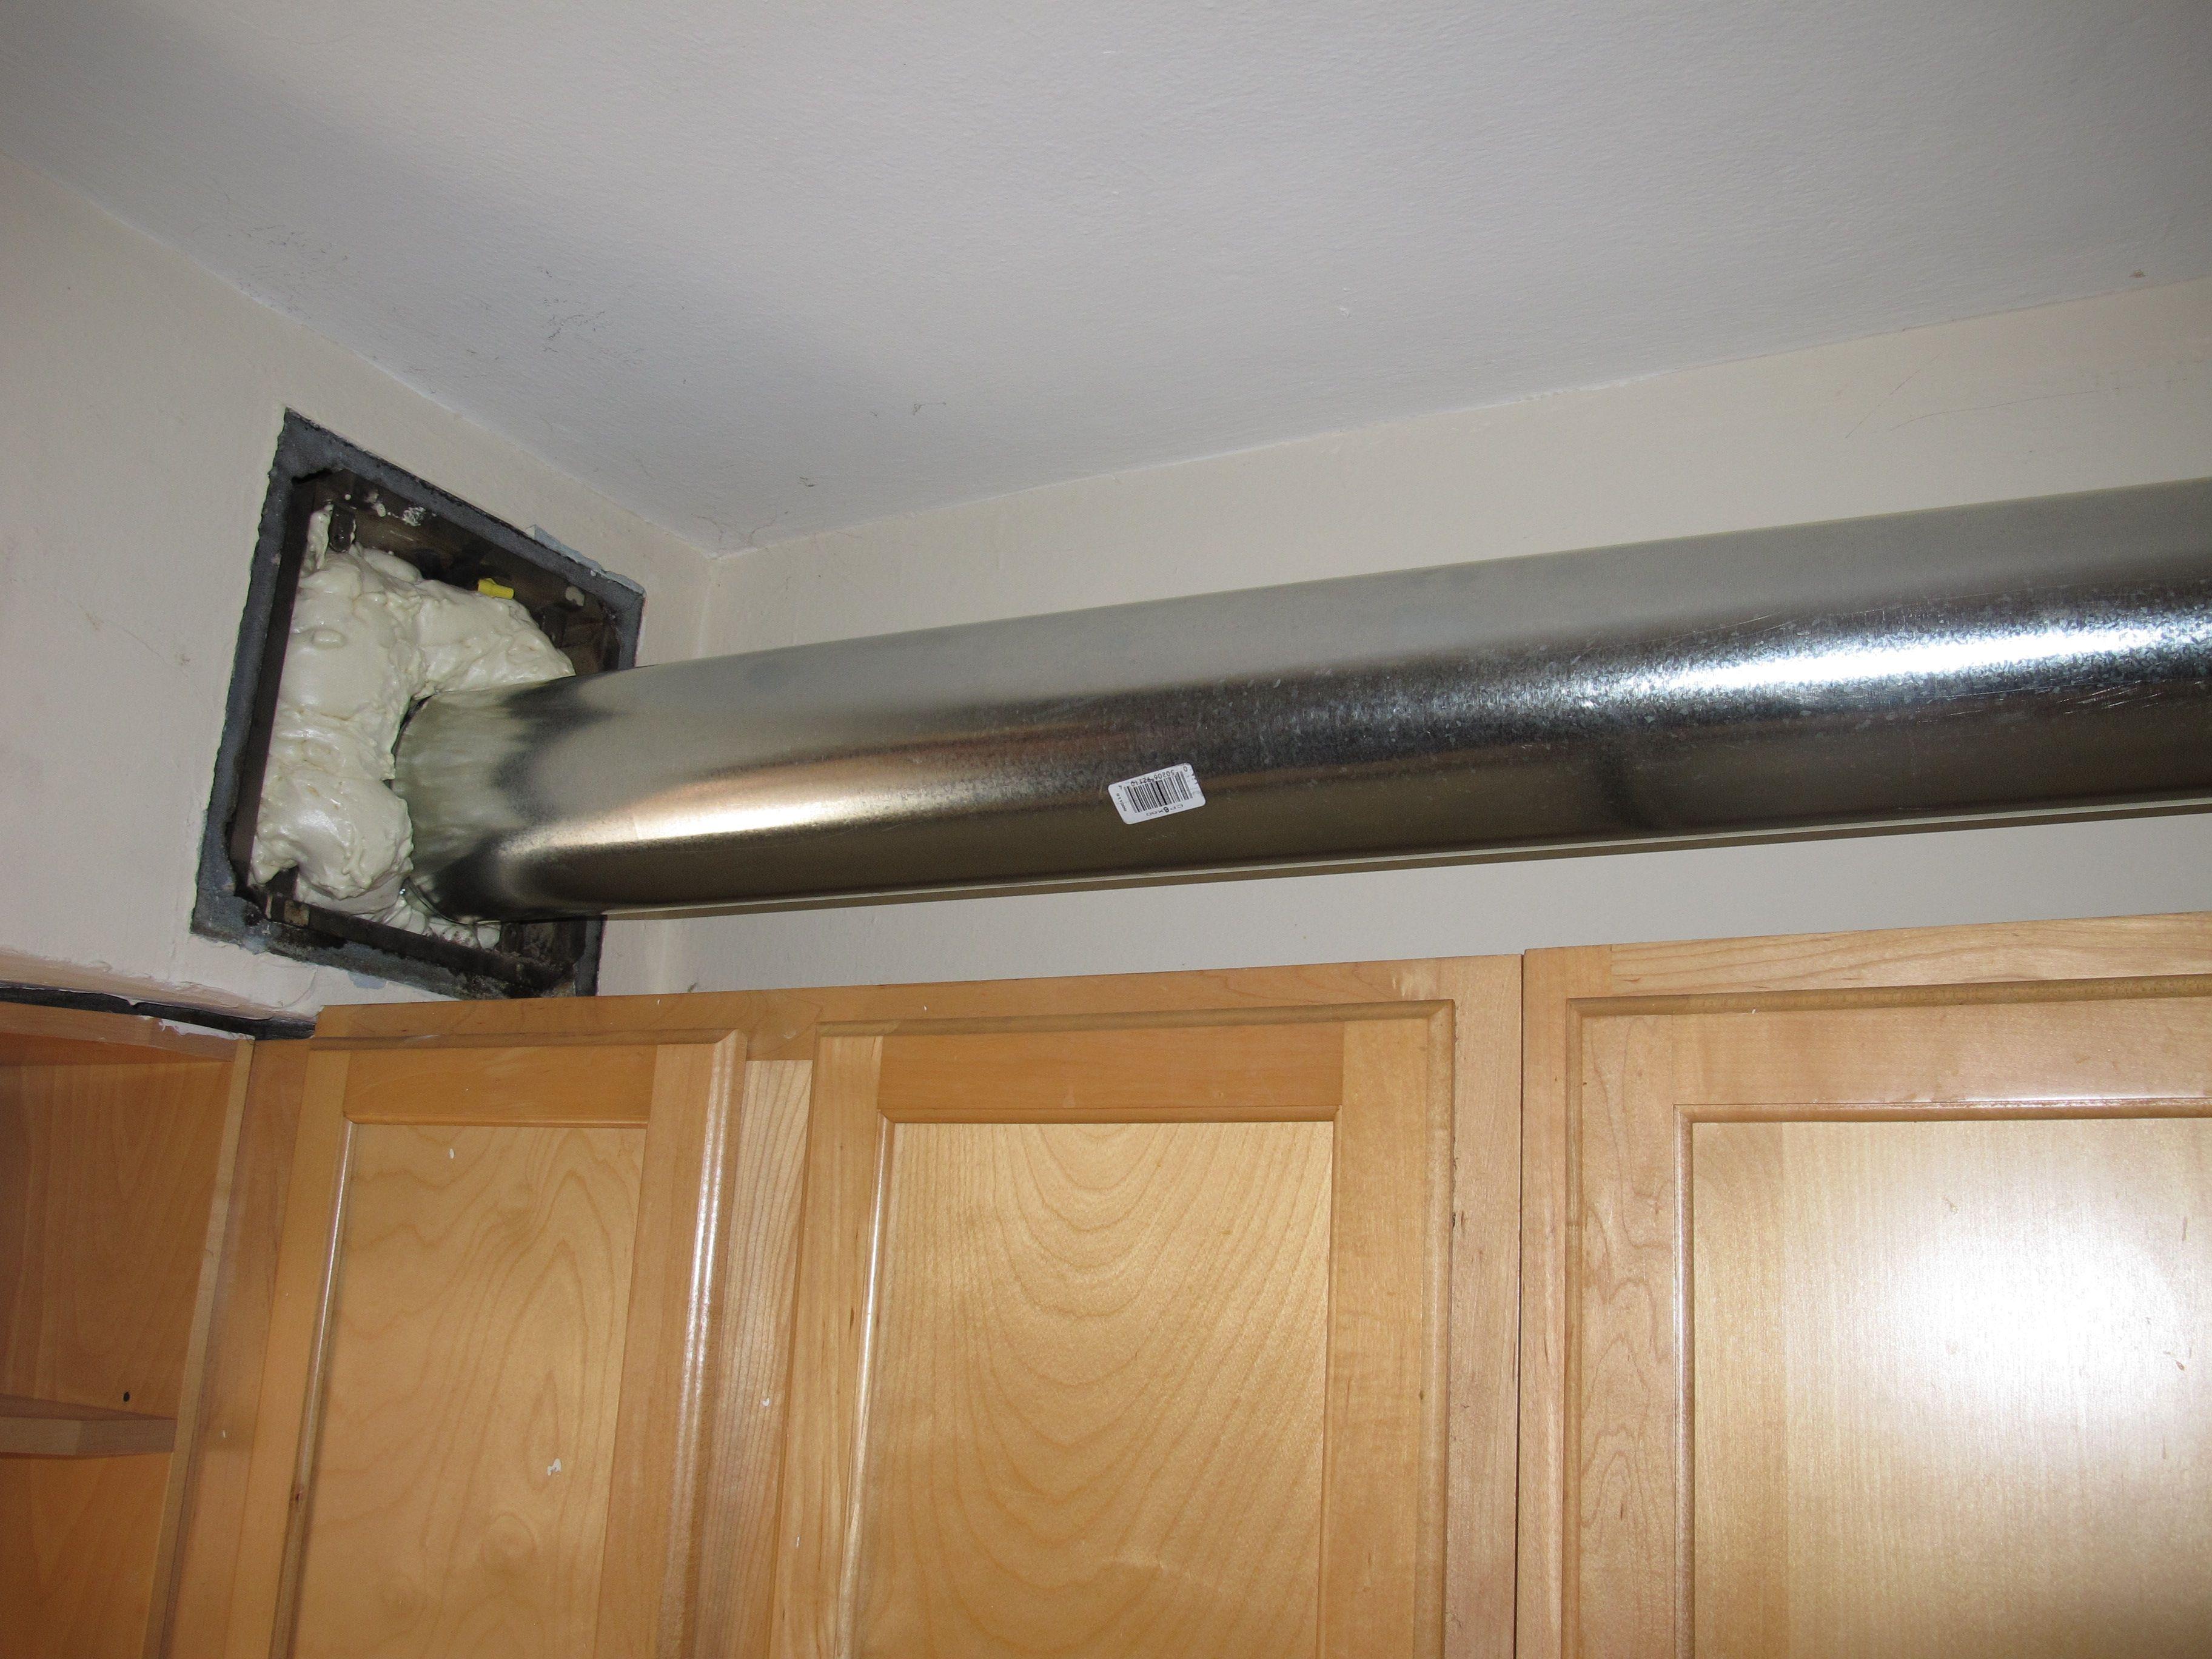 Kitchen Exhaust Fan Duct | http://urresults.us/ | Pinterest